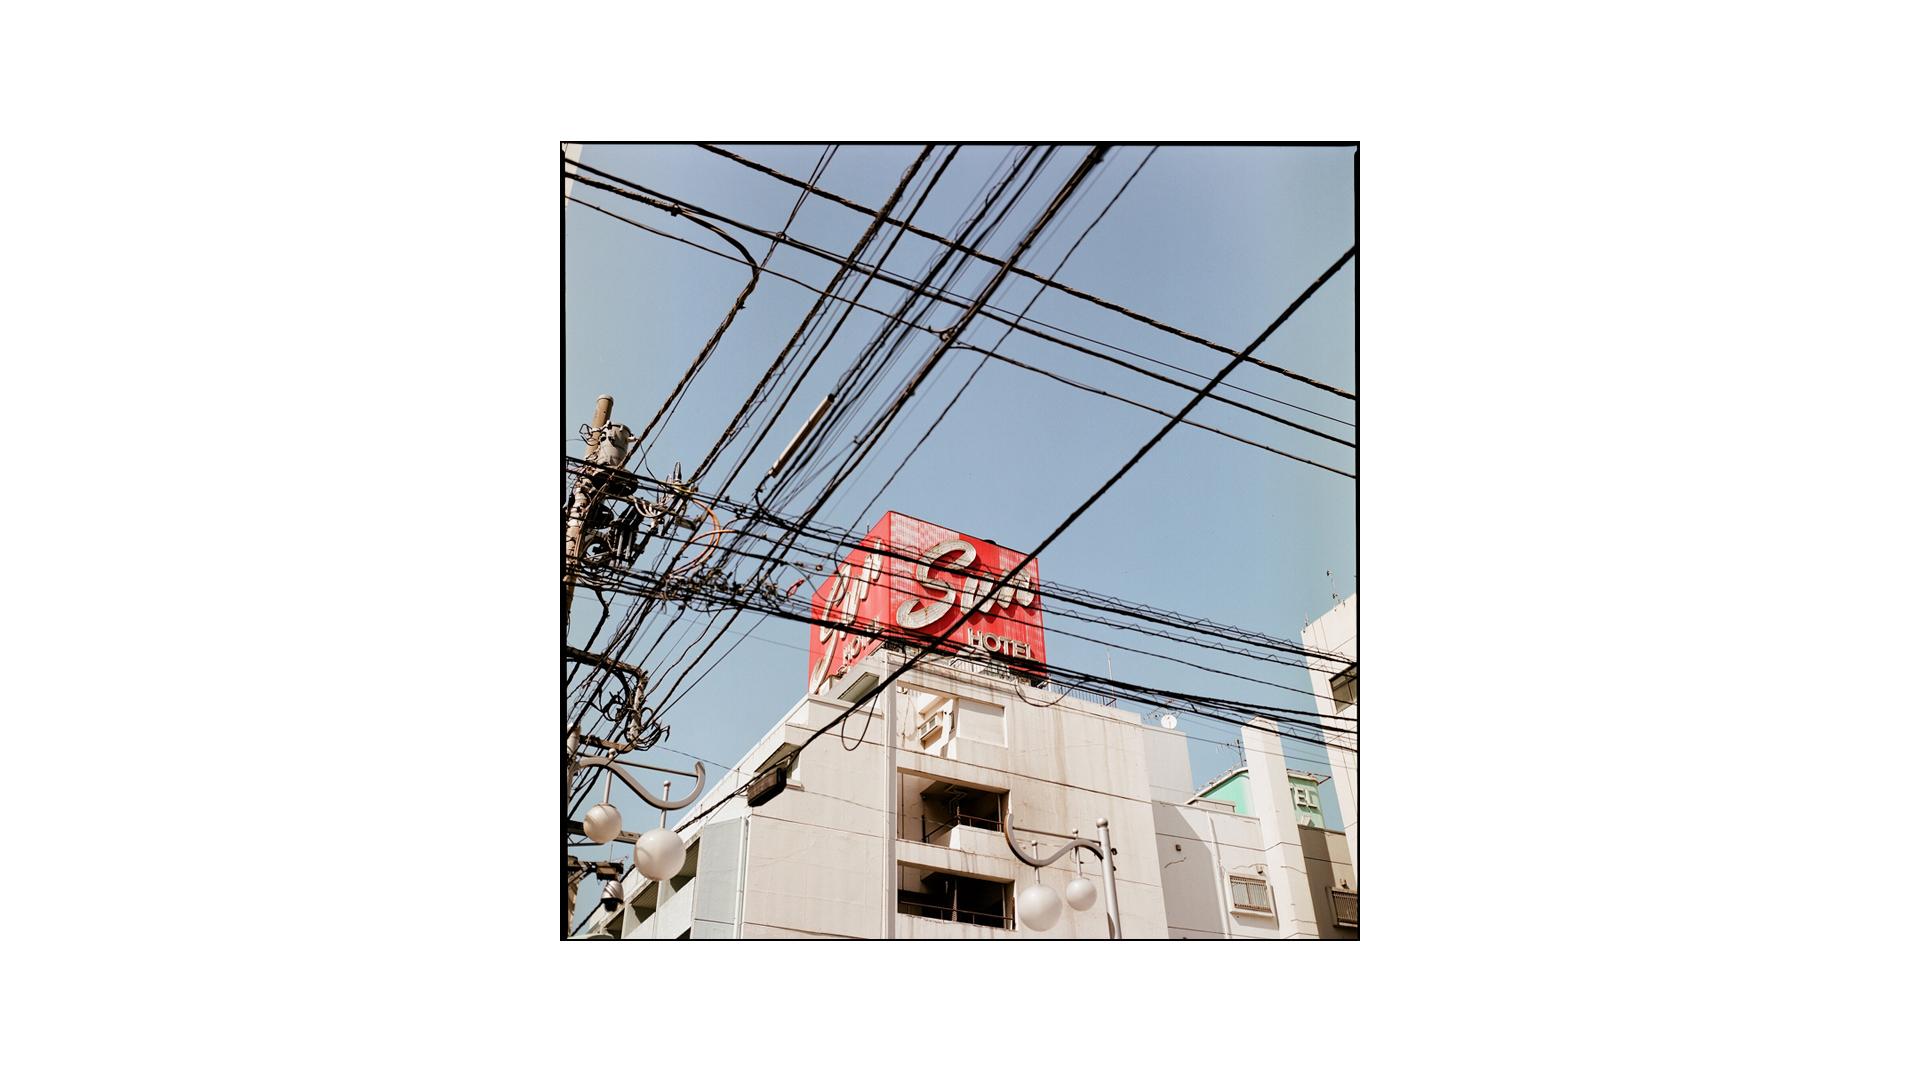 一色一成 | Kzaunari Isshiki